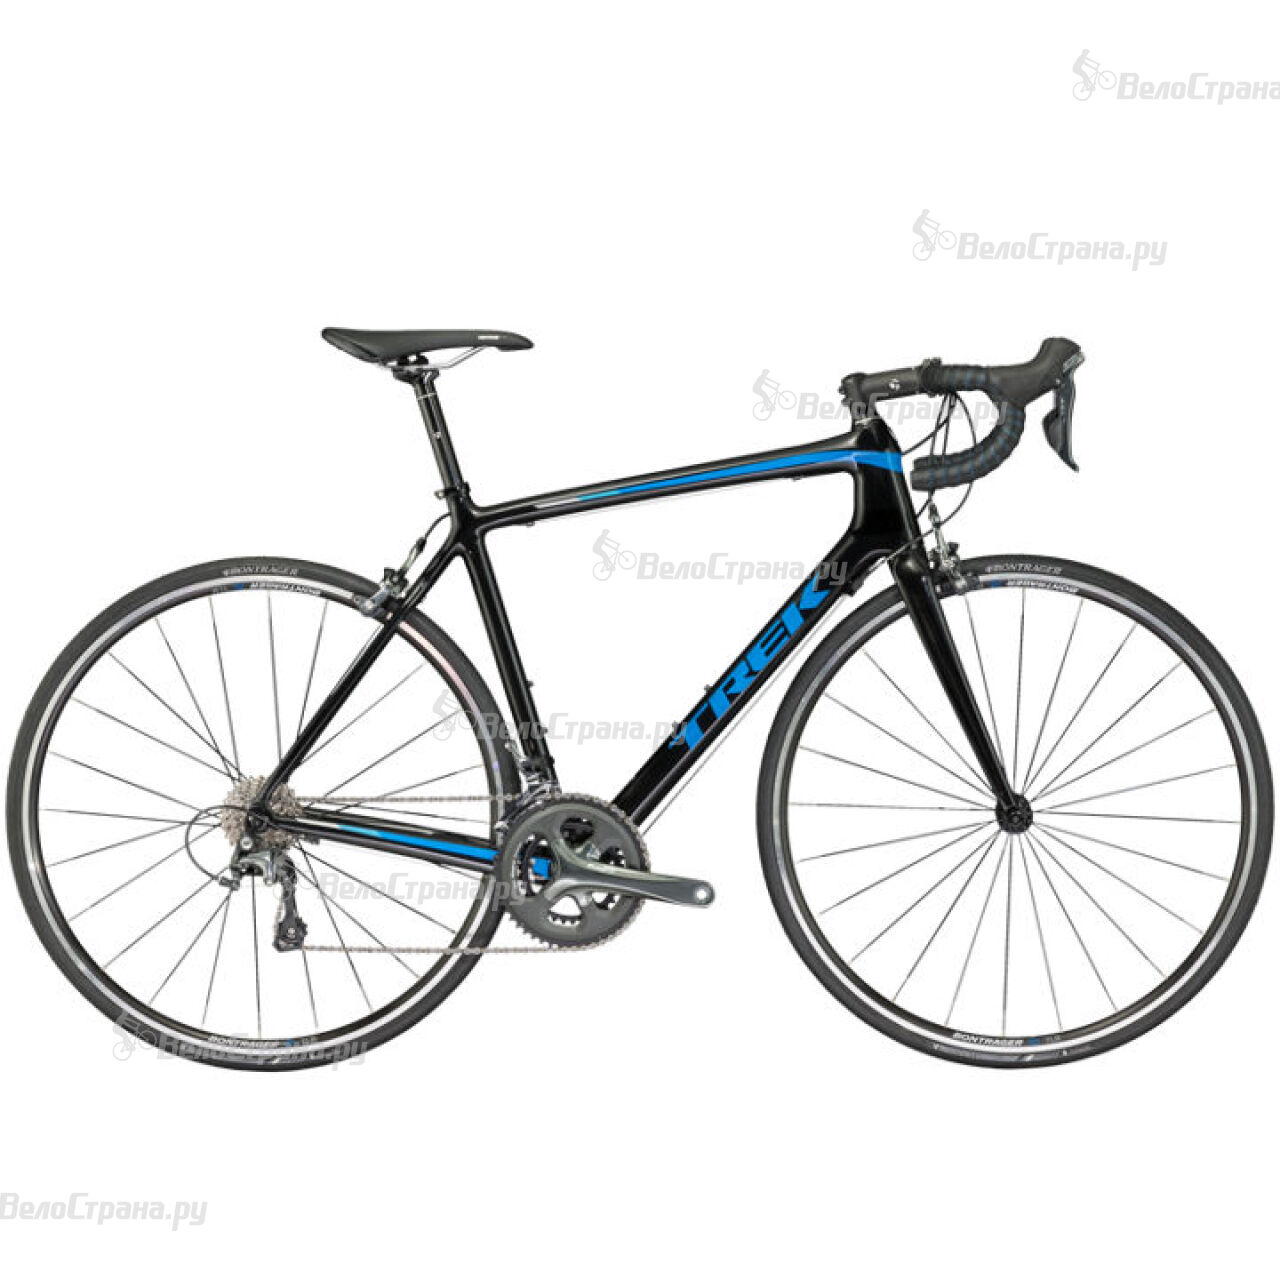 Велосипед Trek Emonda S 4 (2017) велосипед trek emonda s 4 2015